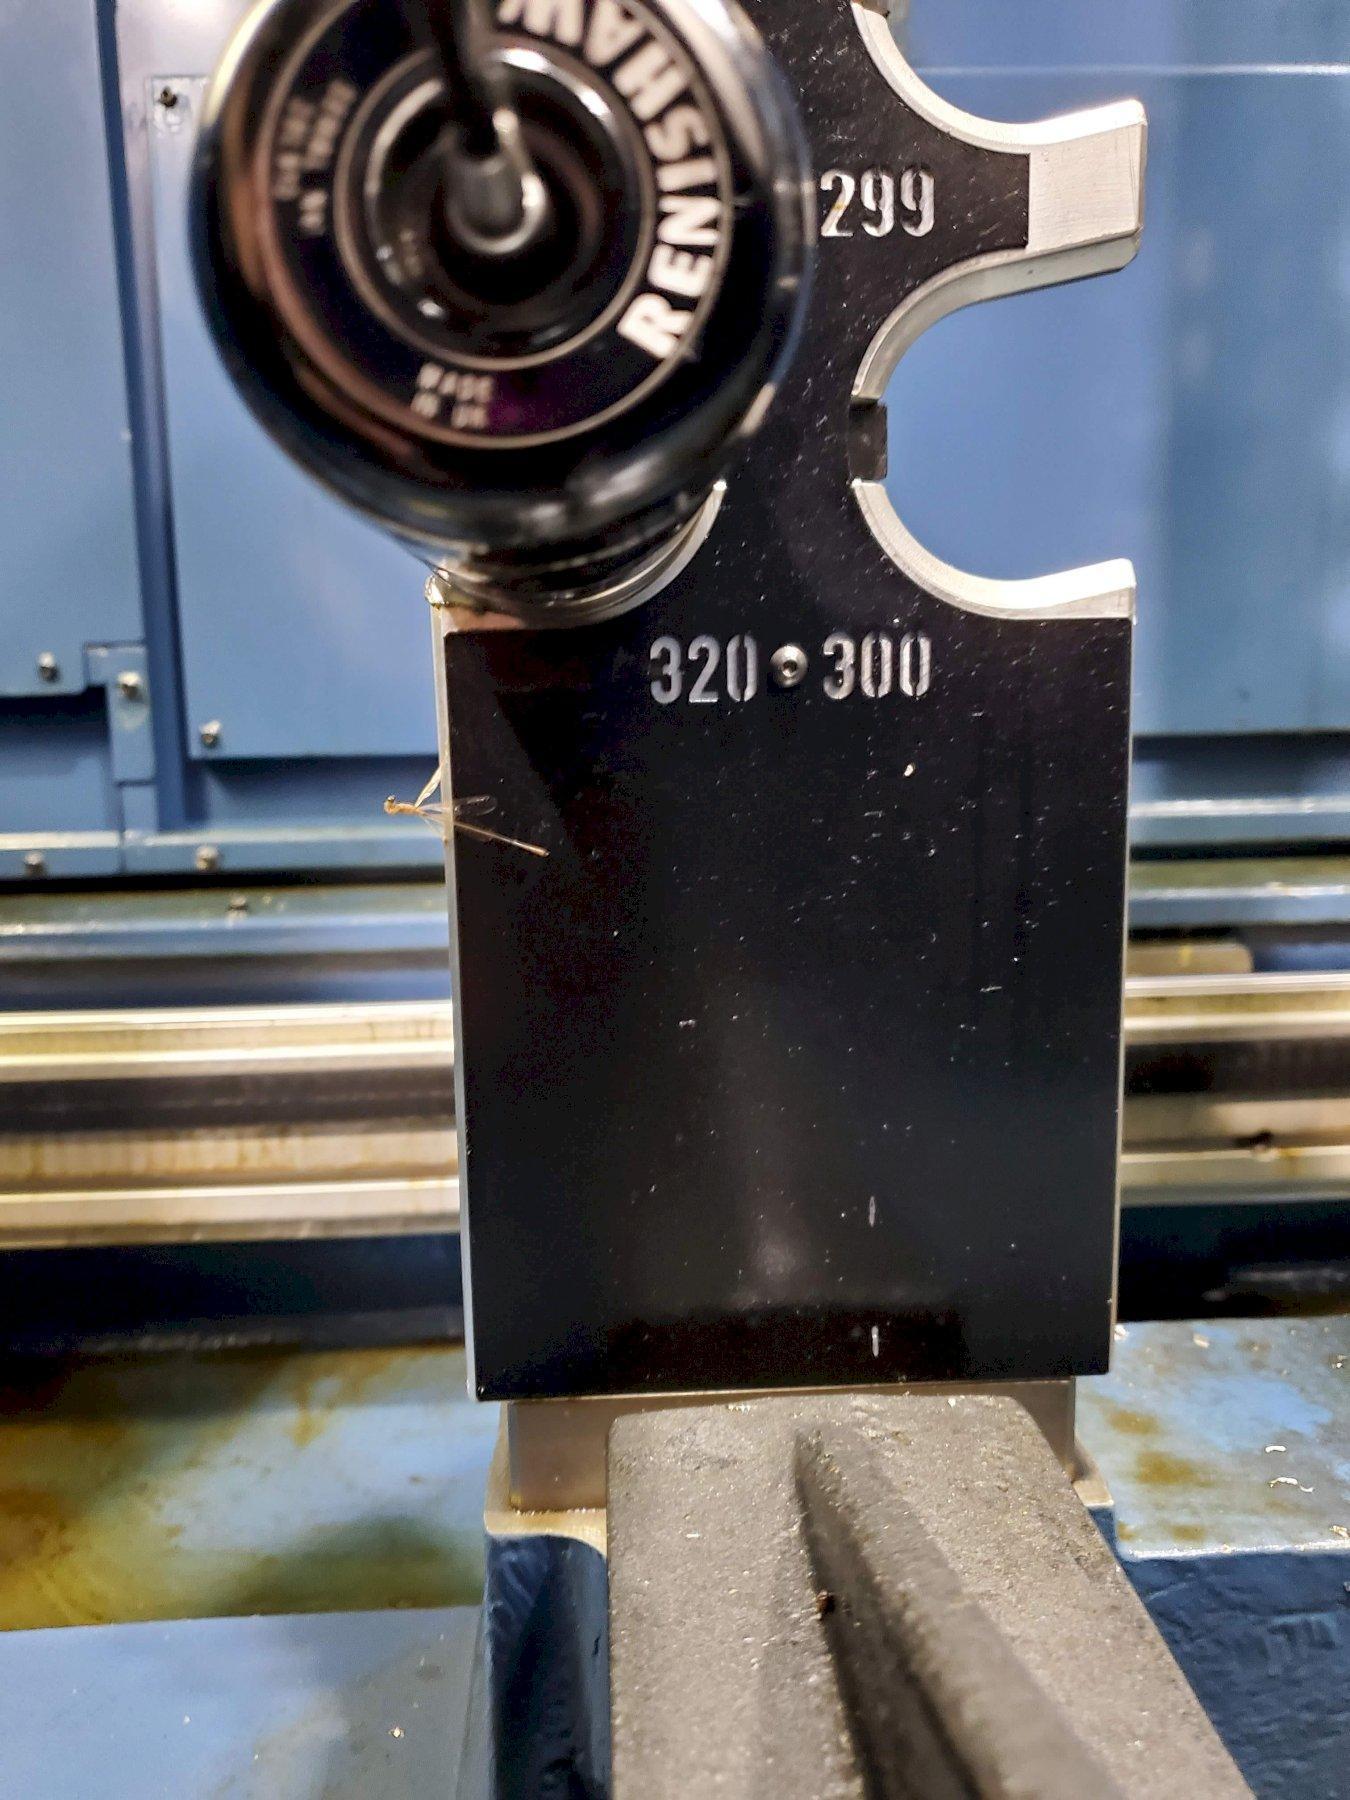 Matsuura MAM72-42V PC24 5-Axis Vertical Machining Center - 2 Available